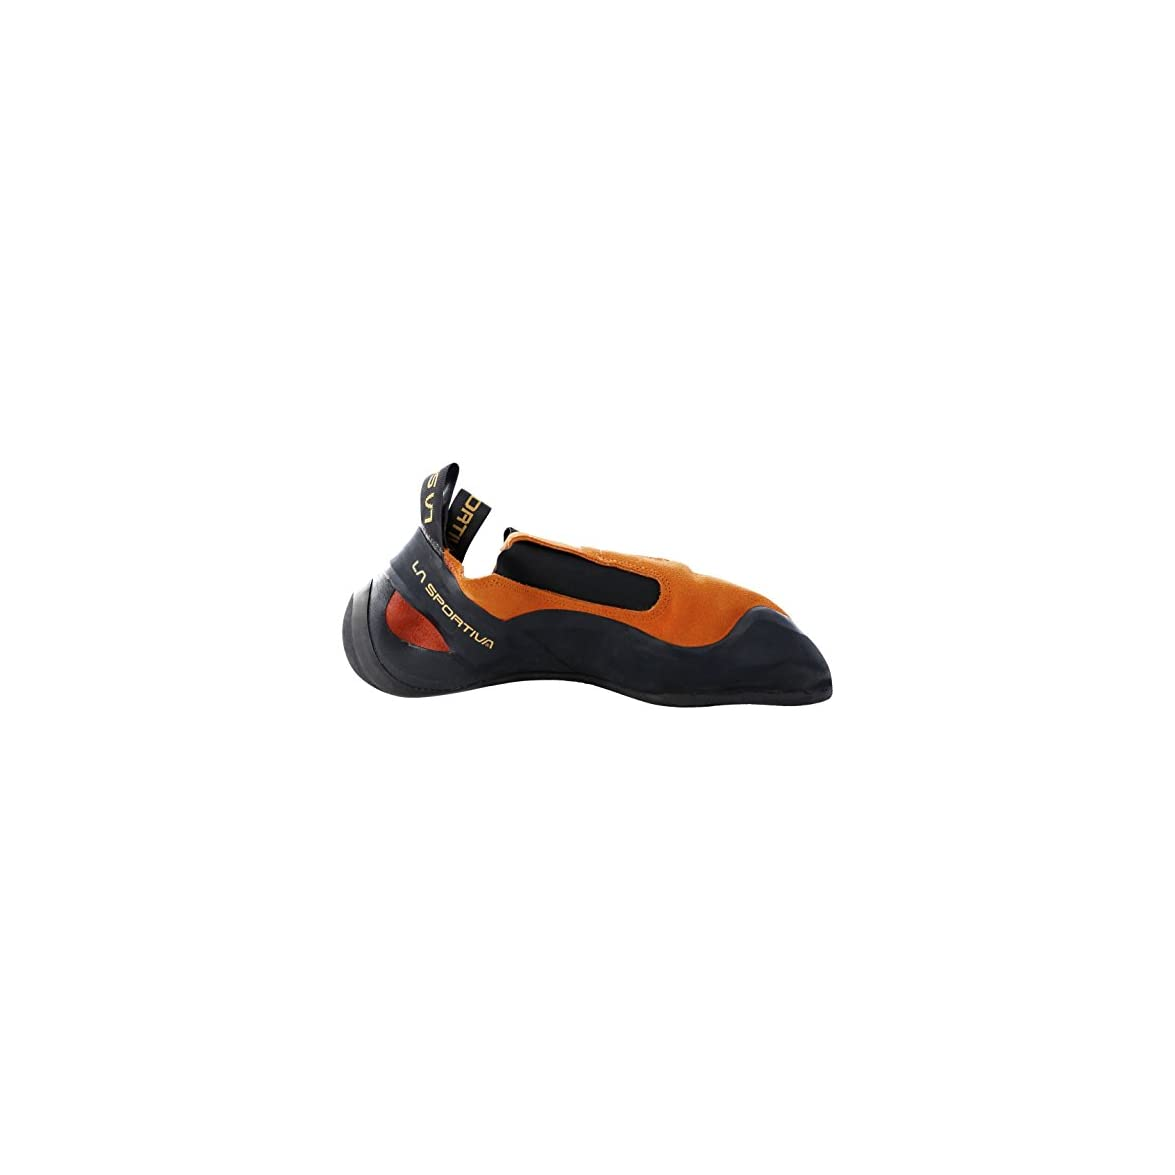 Sportiva Arrampicata La Da Cobra black 38 Orange Scarpa